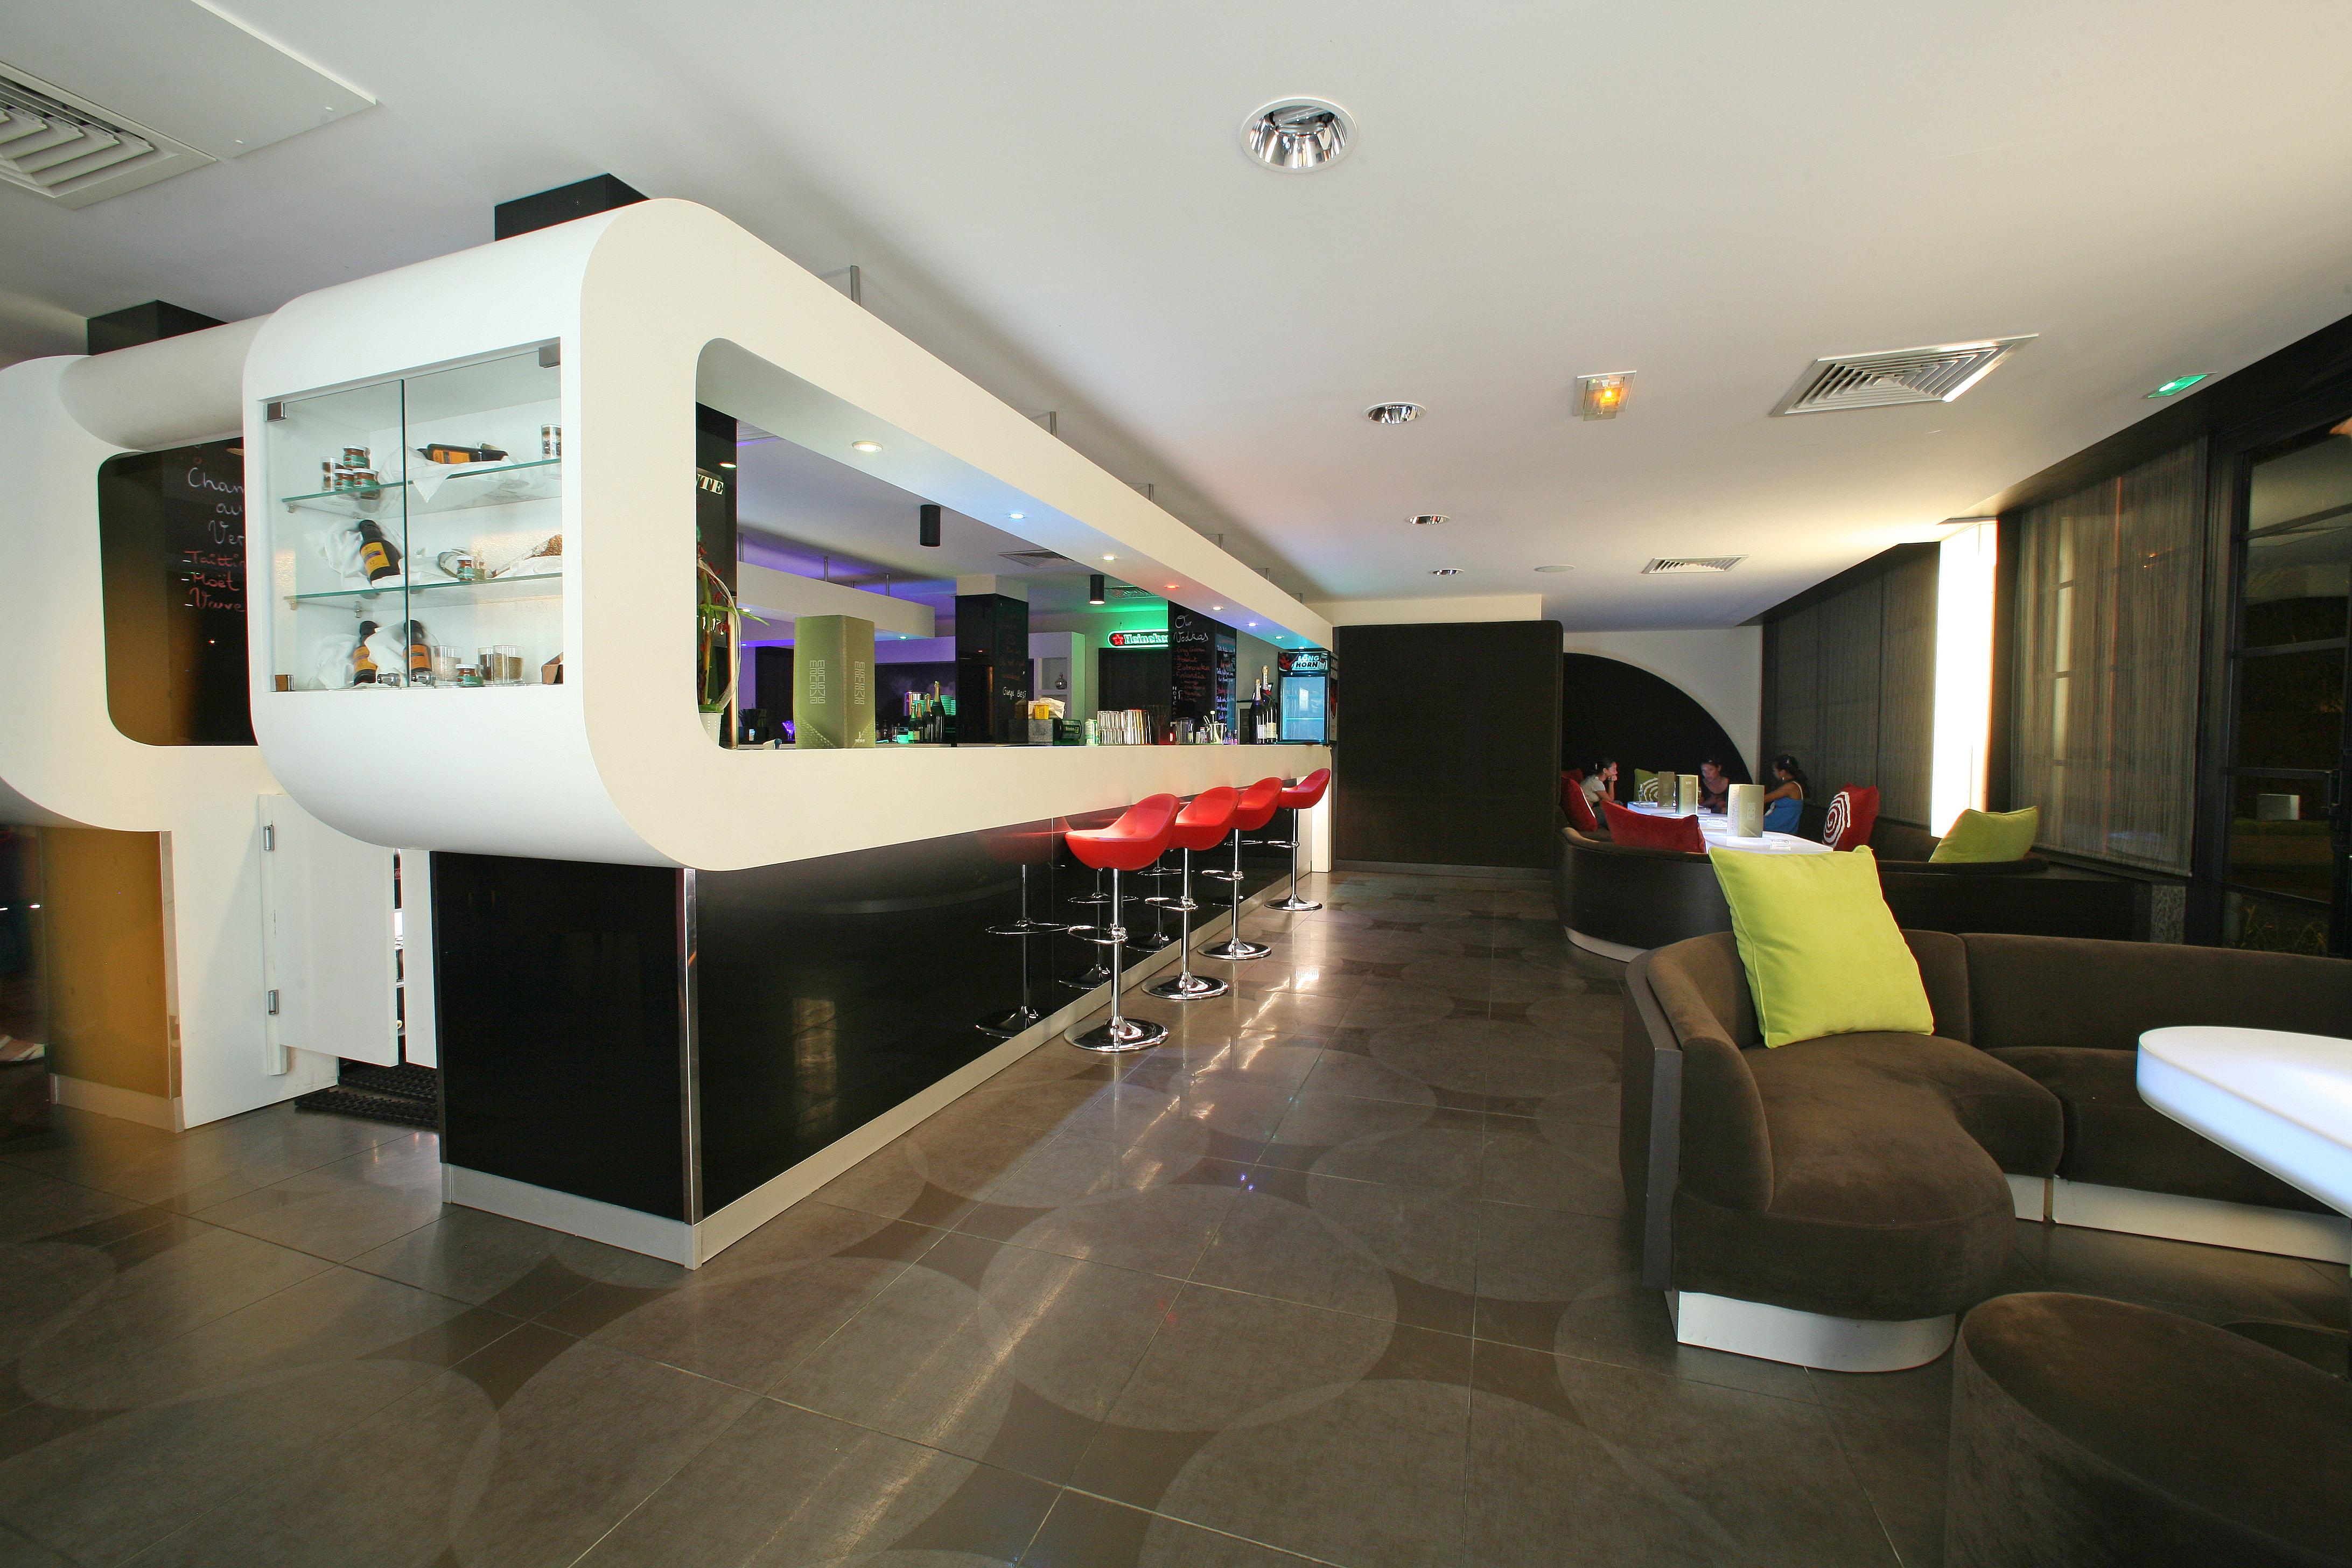 https://tahititourisme.com/wp-content/uploads/2018/03/RESTAURATION-Punavai-Lounge-Bar-1.jpg